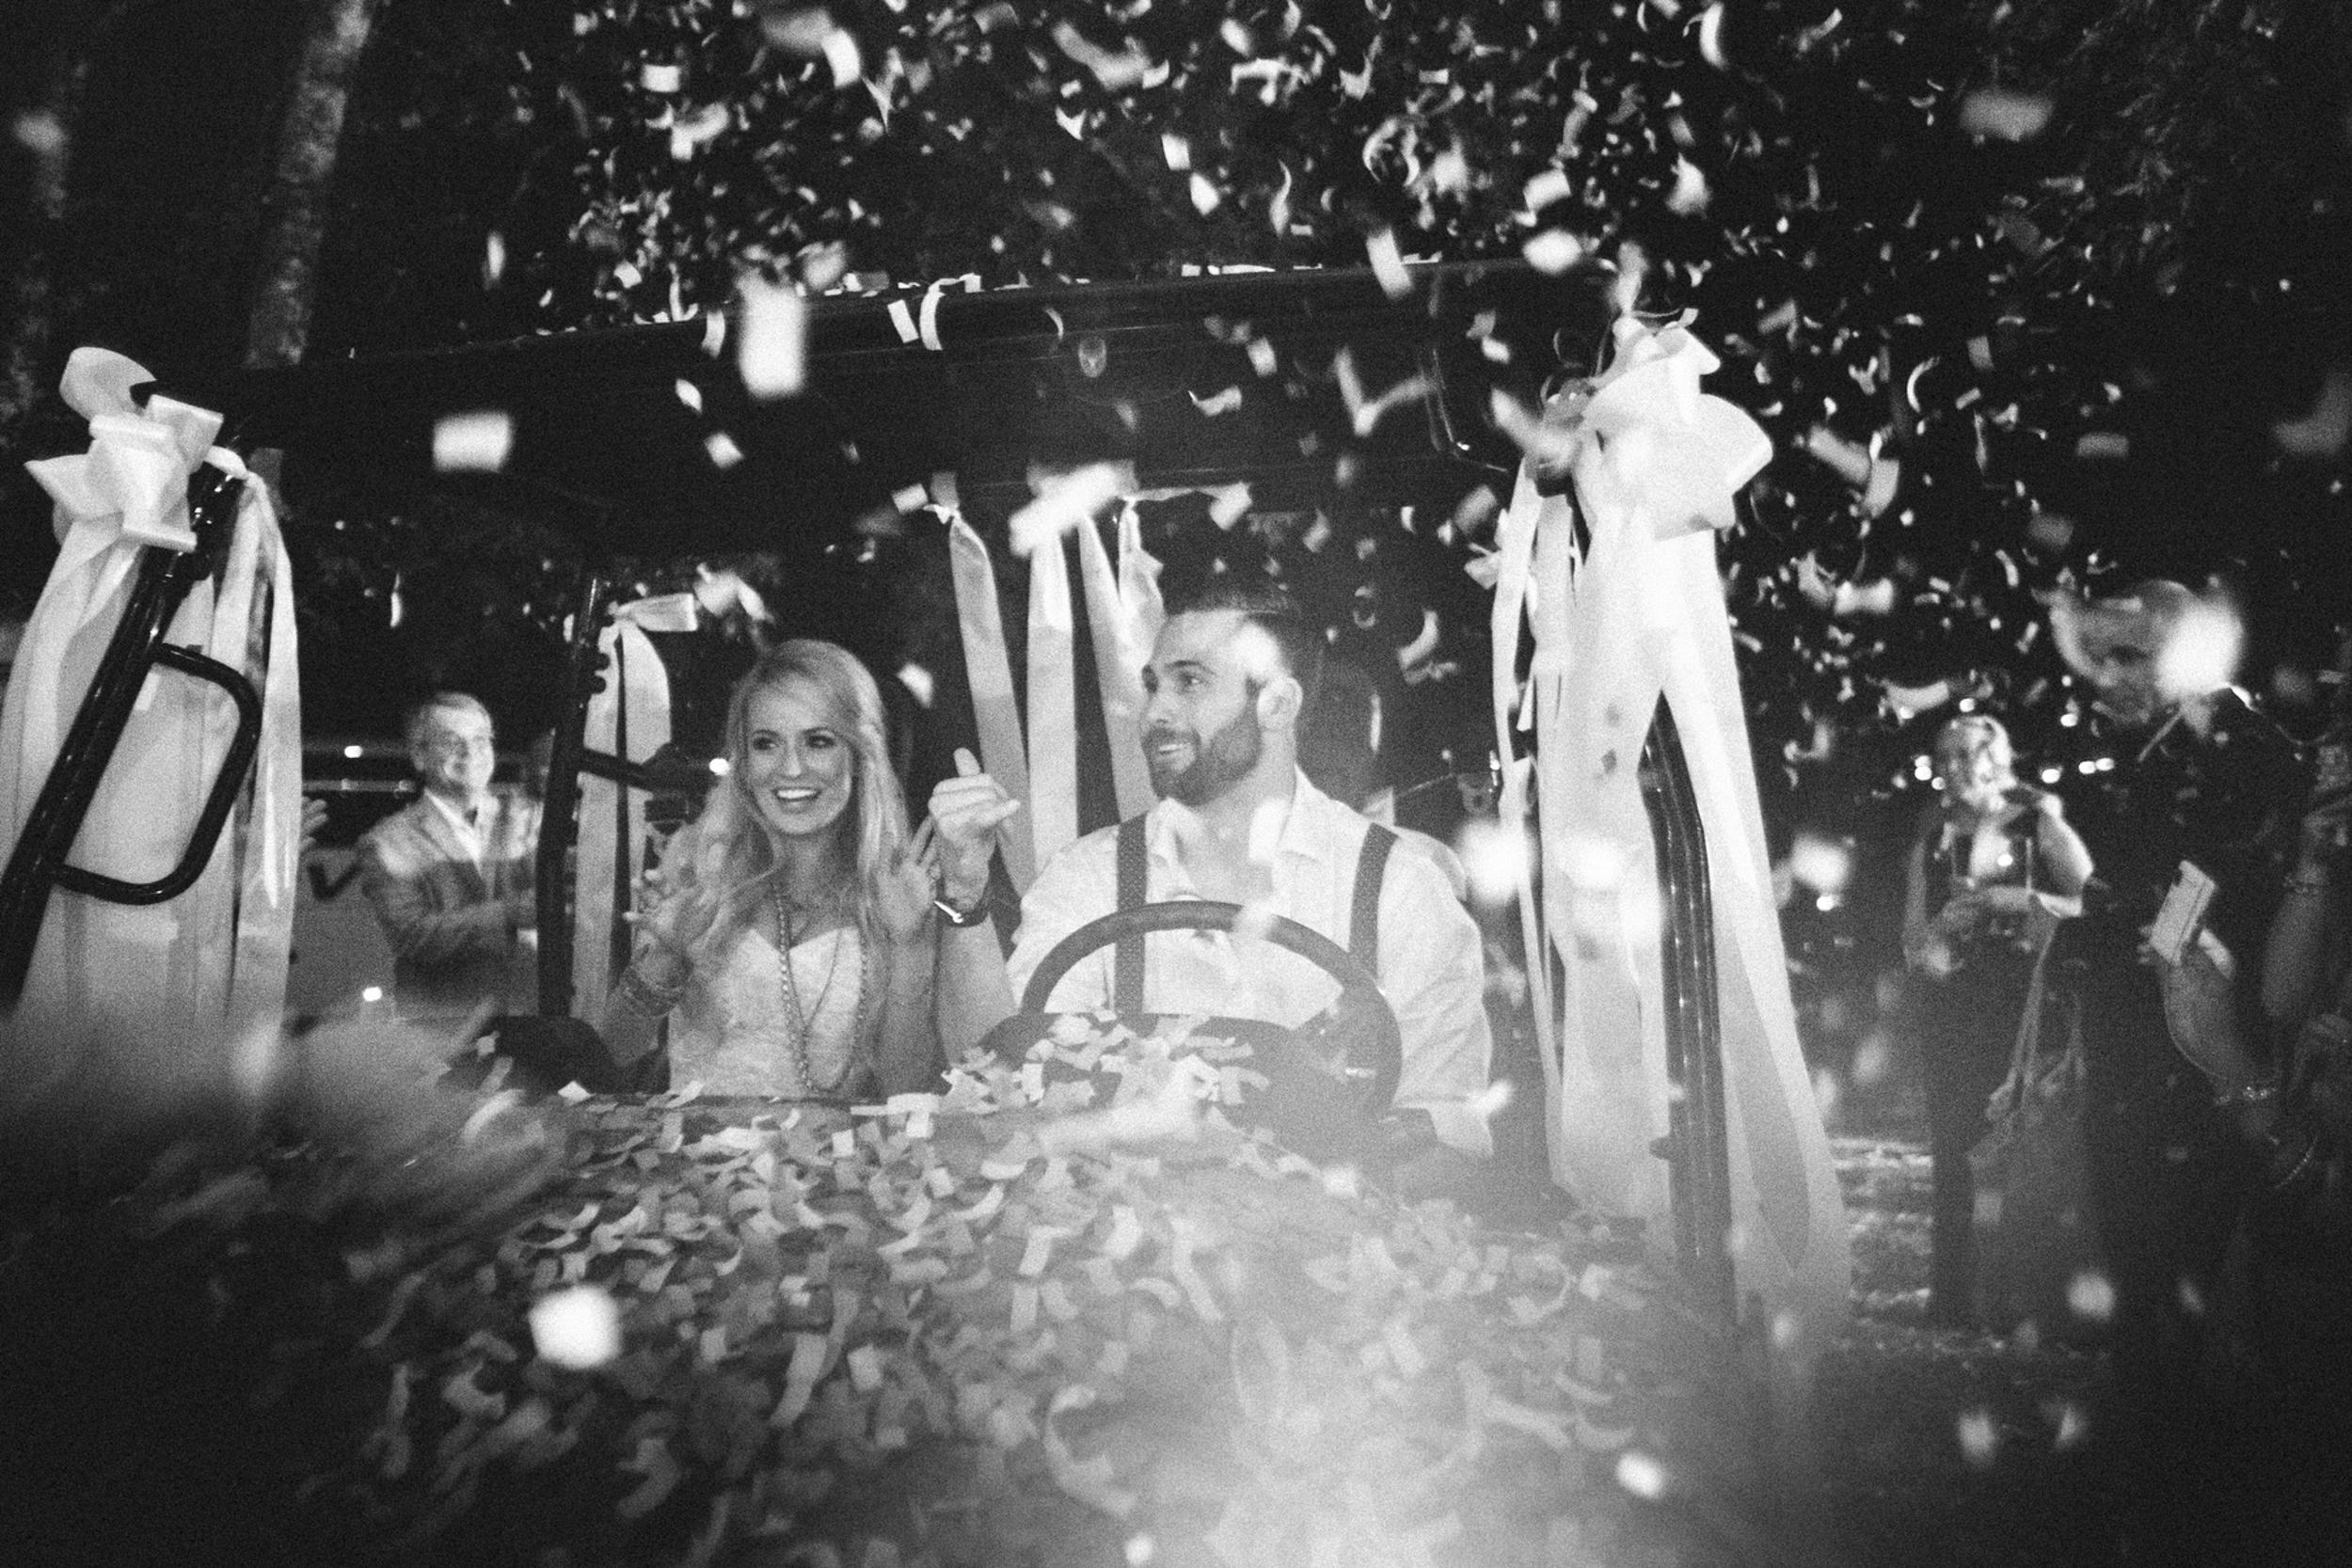 south_carolina_farm_wedding_rustic_chic_surprise_secret_luxe_wedding_bachelorette_emily_maynard_real_weddings-41.jpg